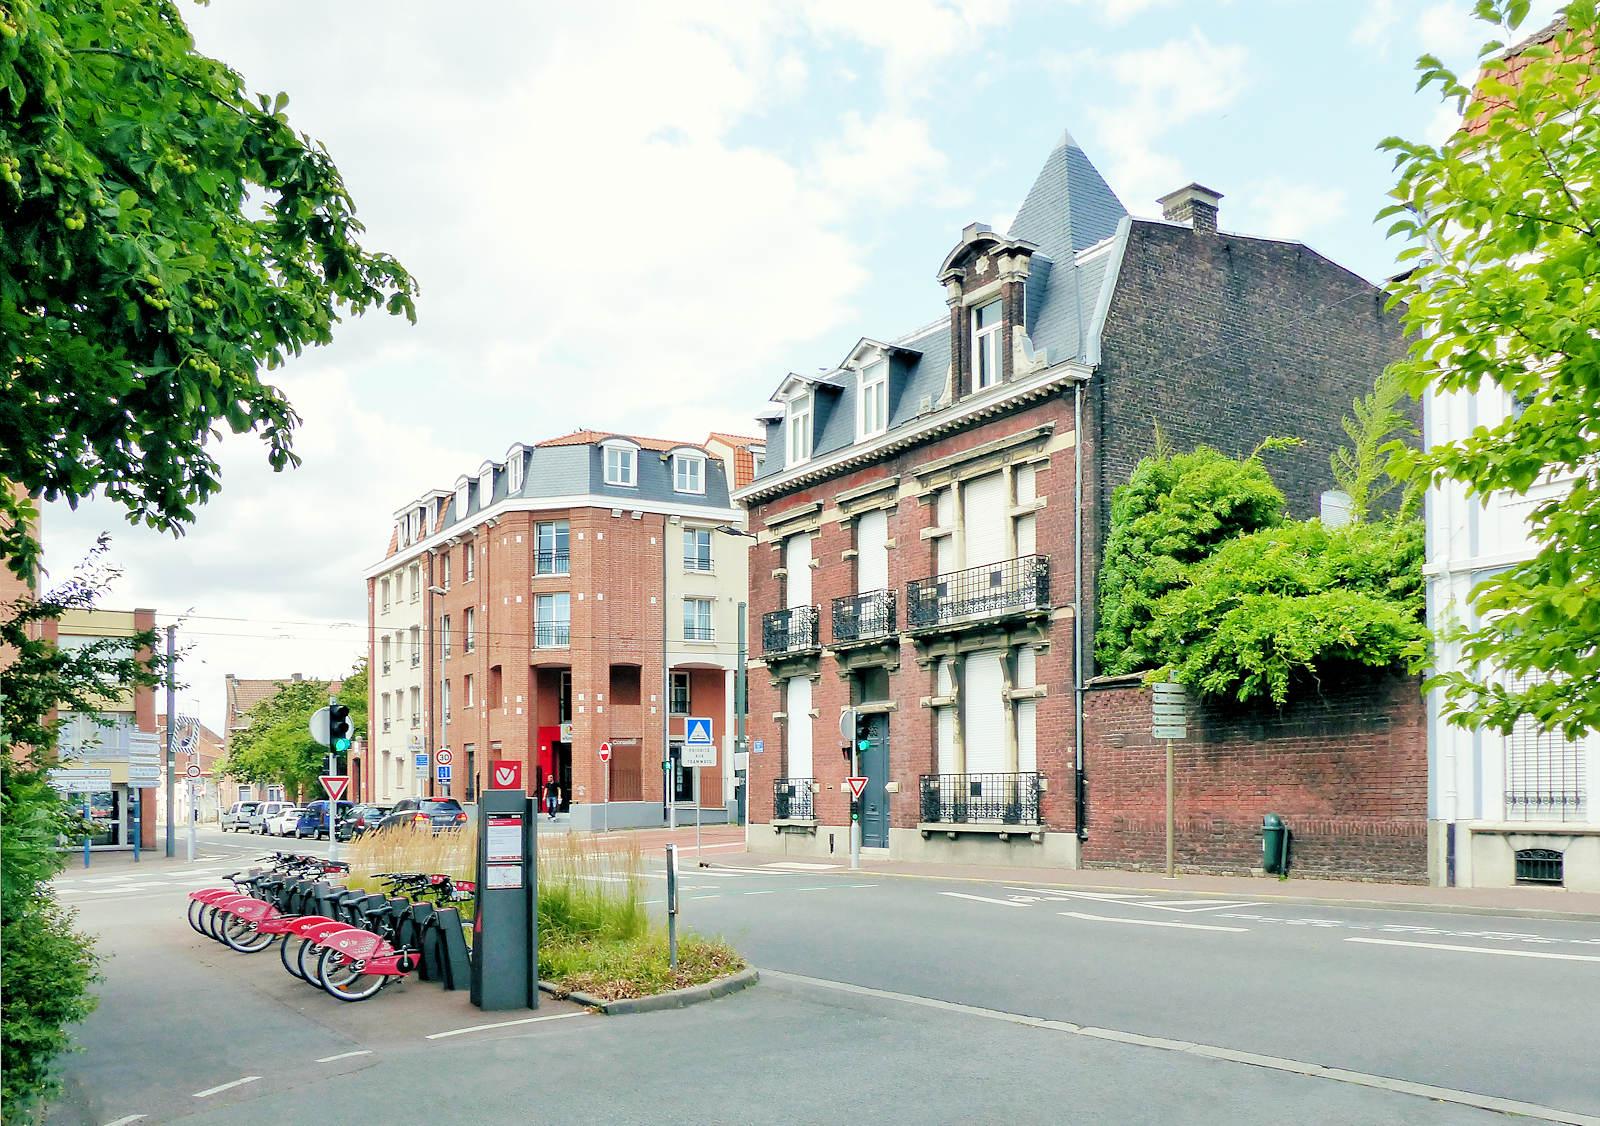 V'Lille Victoire - Vilogia Tourcoing